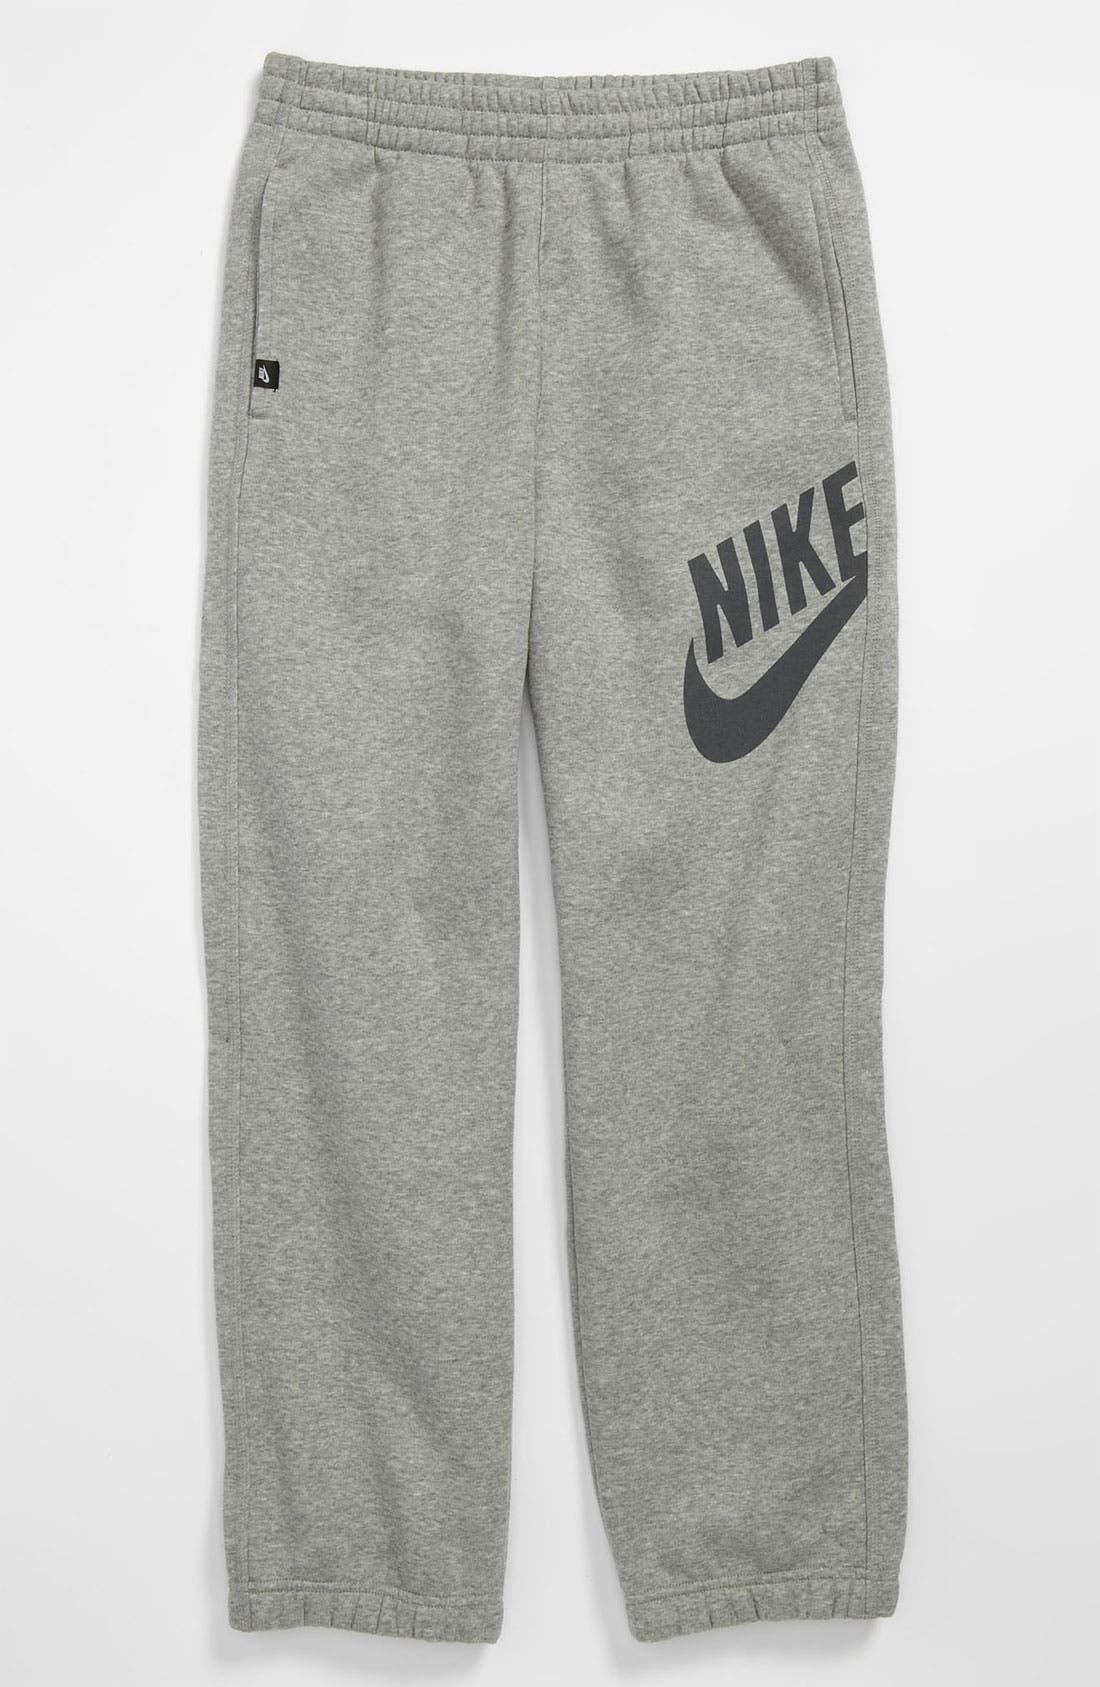 Alternate Image 1 Selected - Nike 'Limitless' Pants (Big Boys)